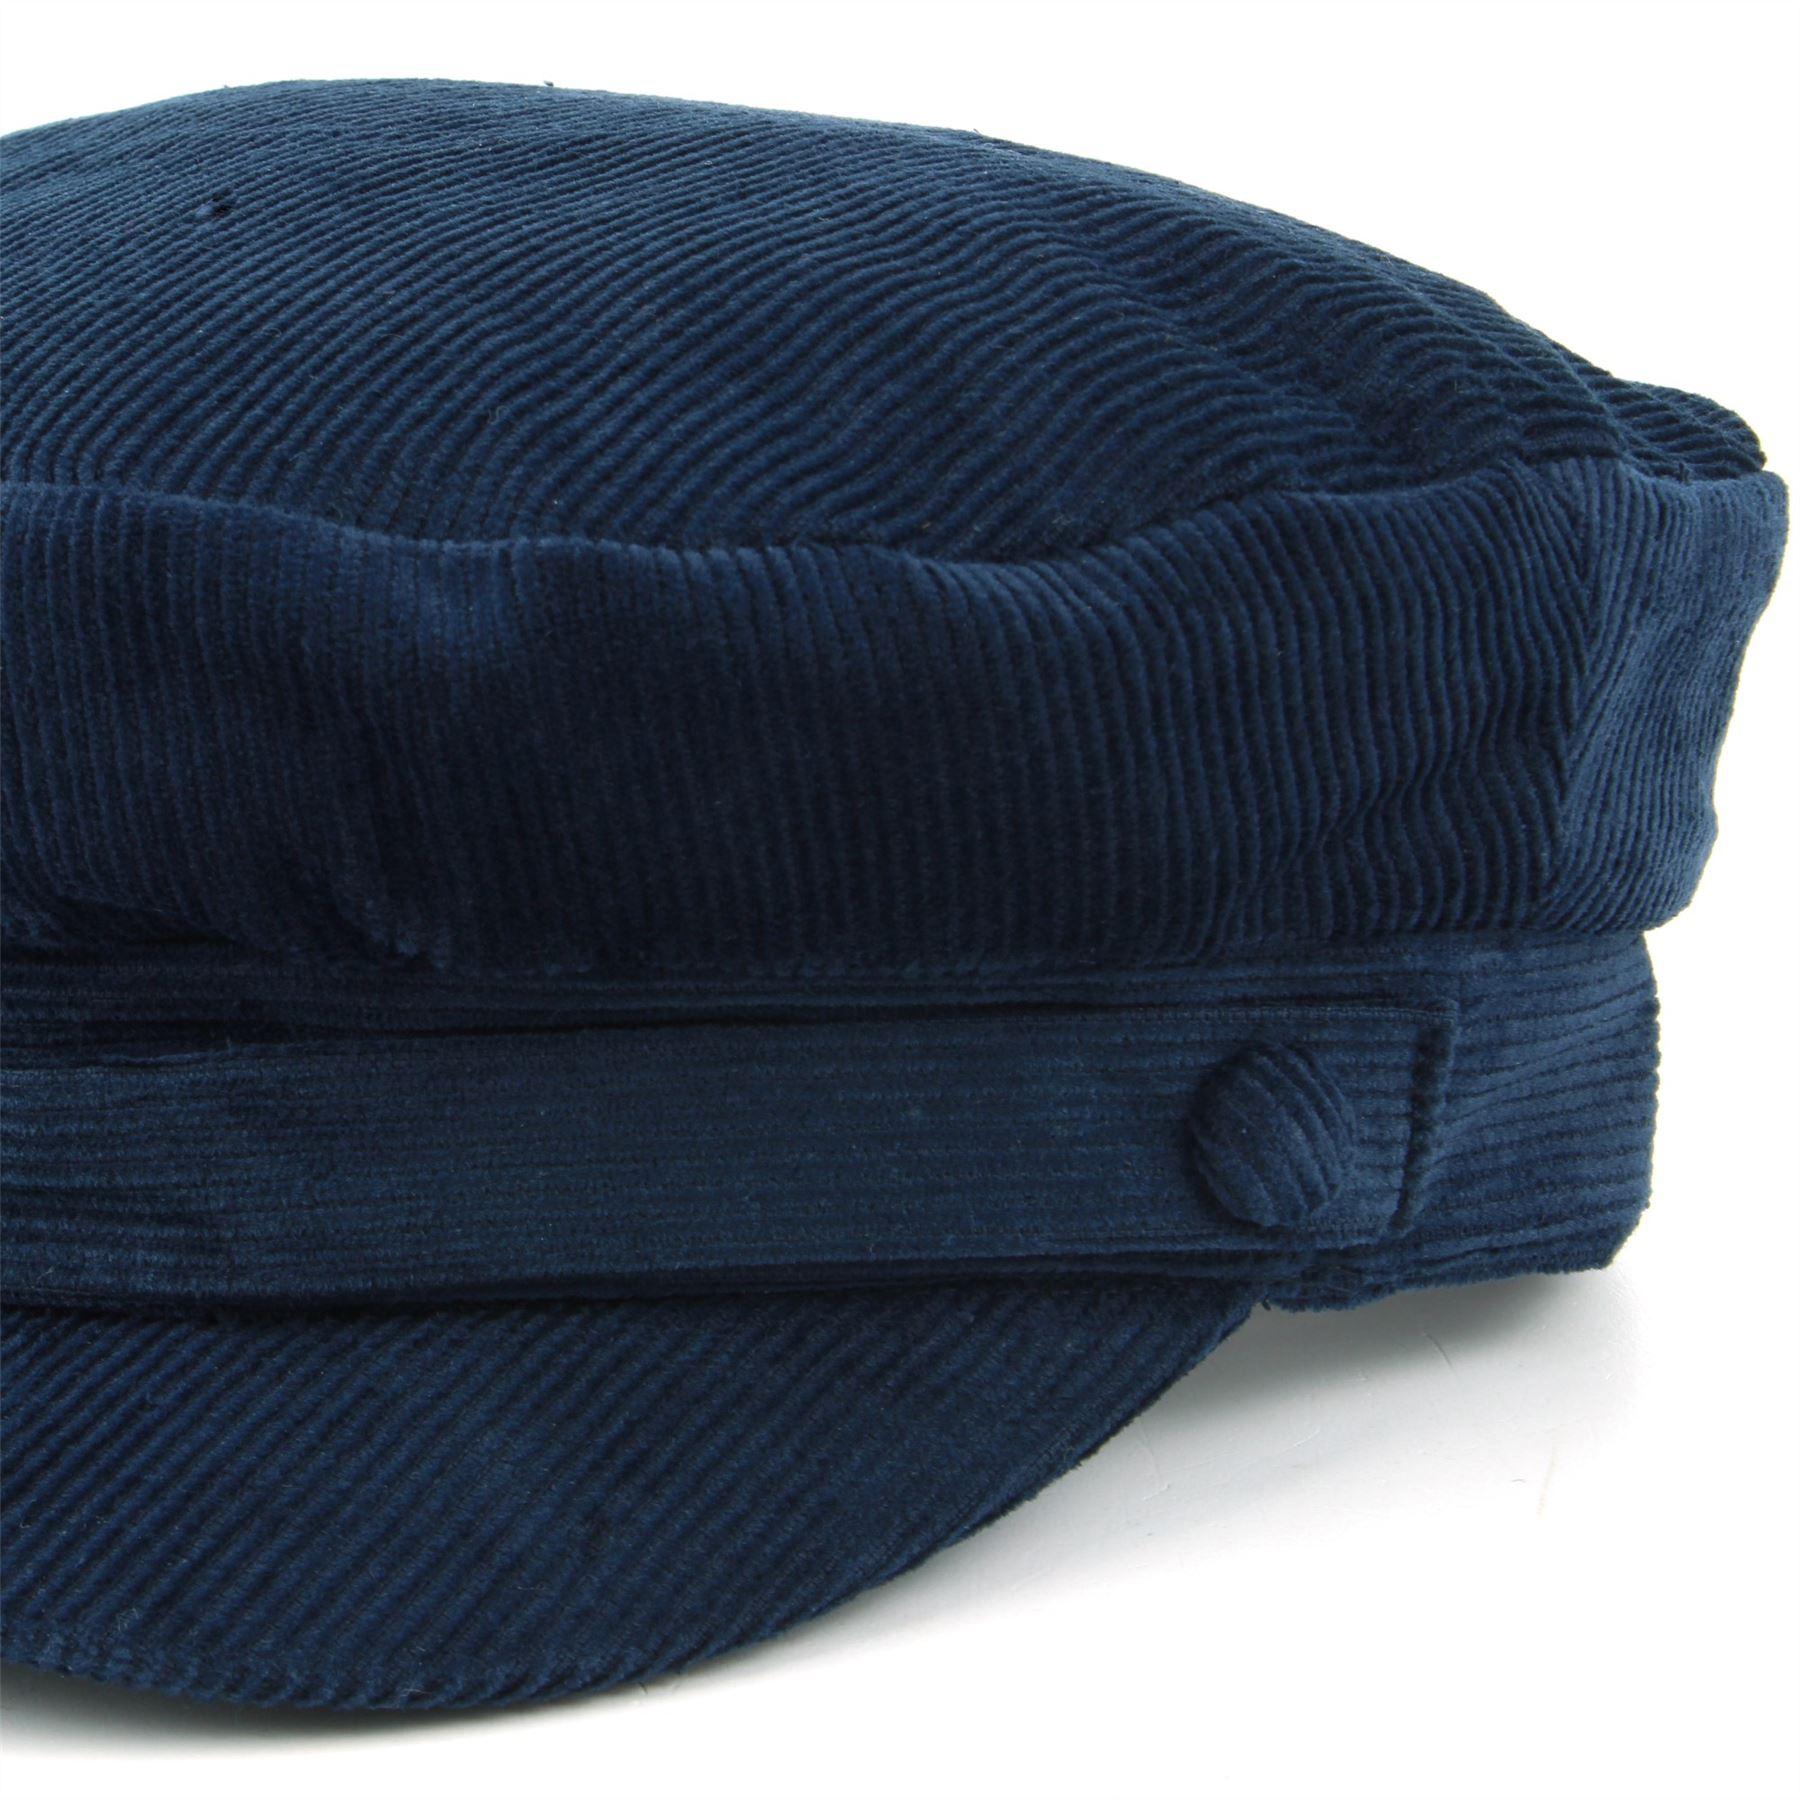 8686758239e Captain s Cap Breton Hat Cord BLACK NAVY BLUE Mariner Lennon ...